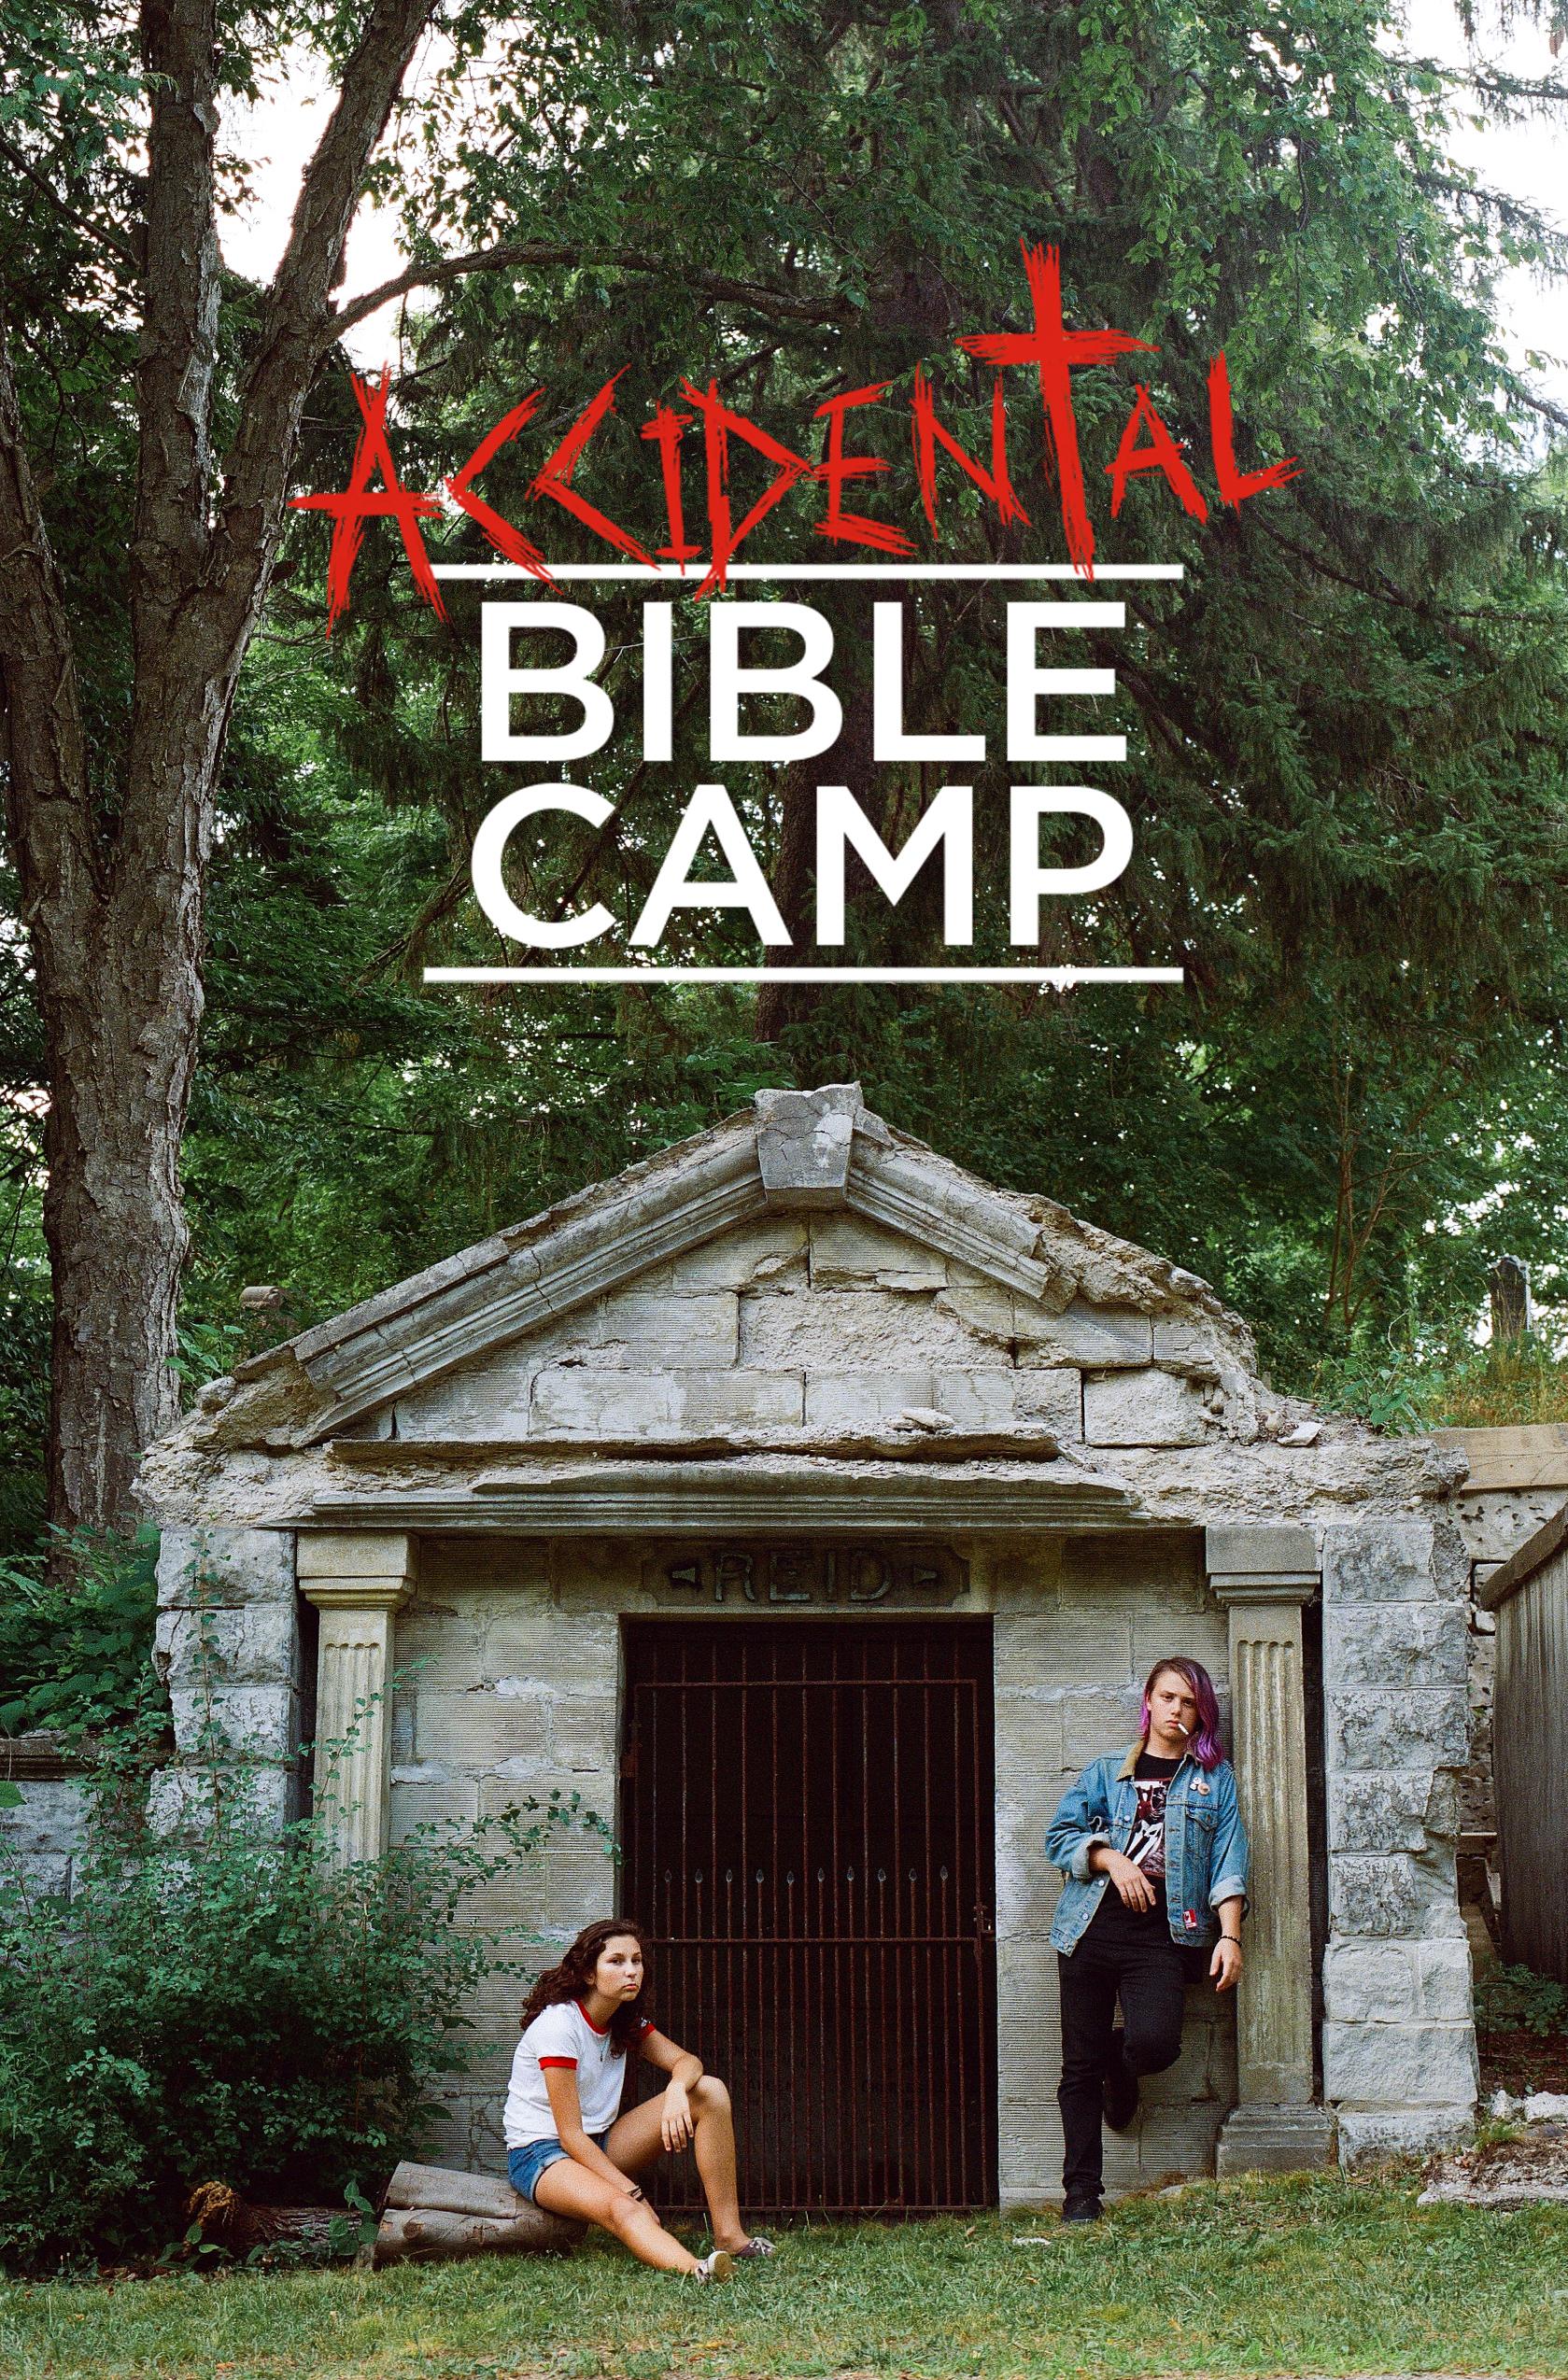 Accidental Bible Camp - 2017 | English | Drama | 16 minDir. Olivia D'OliveiraSin! Jesus Christ! Bingo Night! Alex is accidentally thrown into the wicked world of Bible Camp.